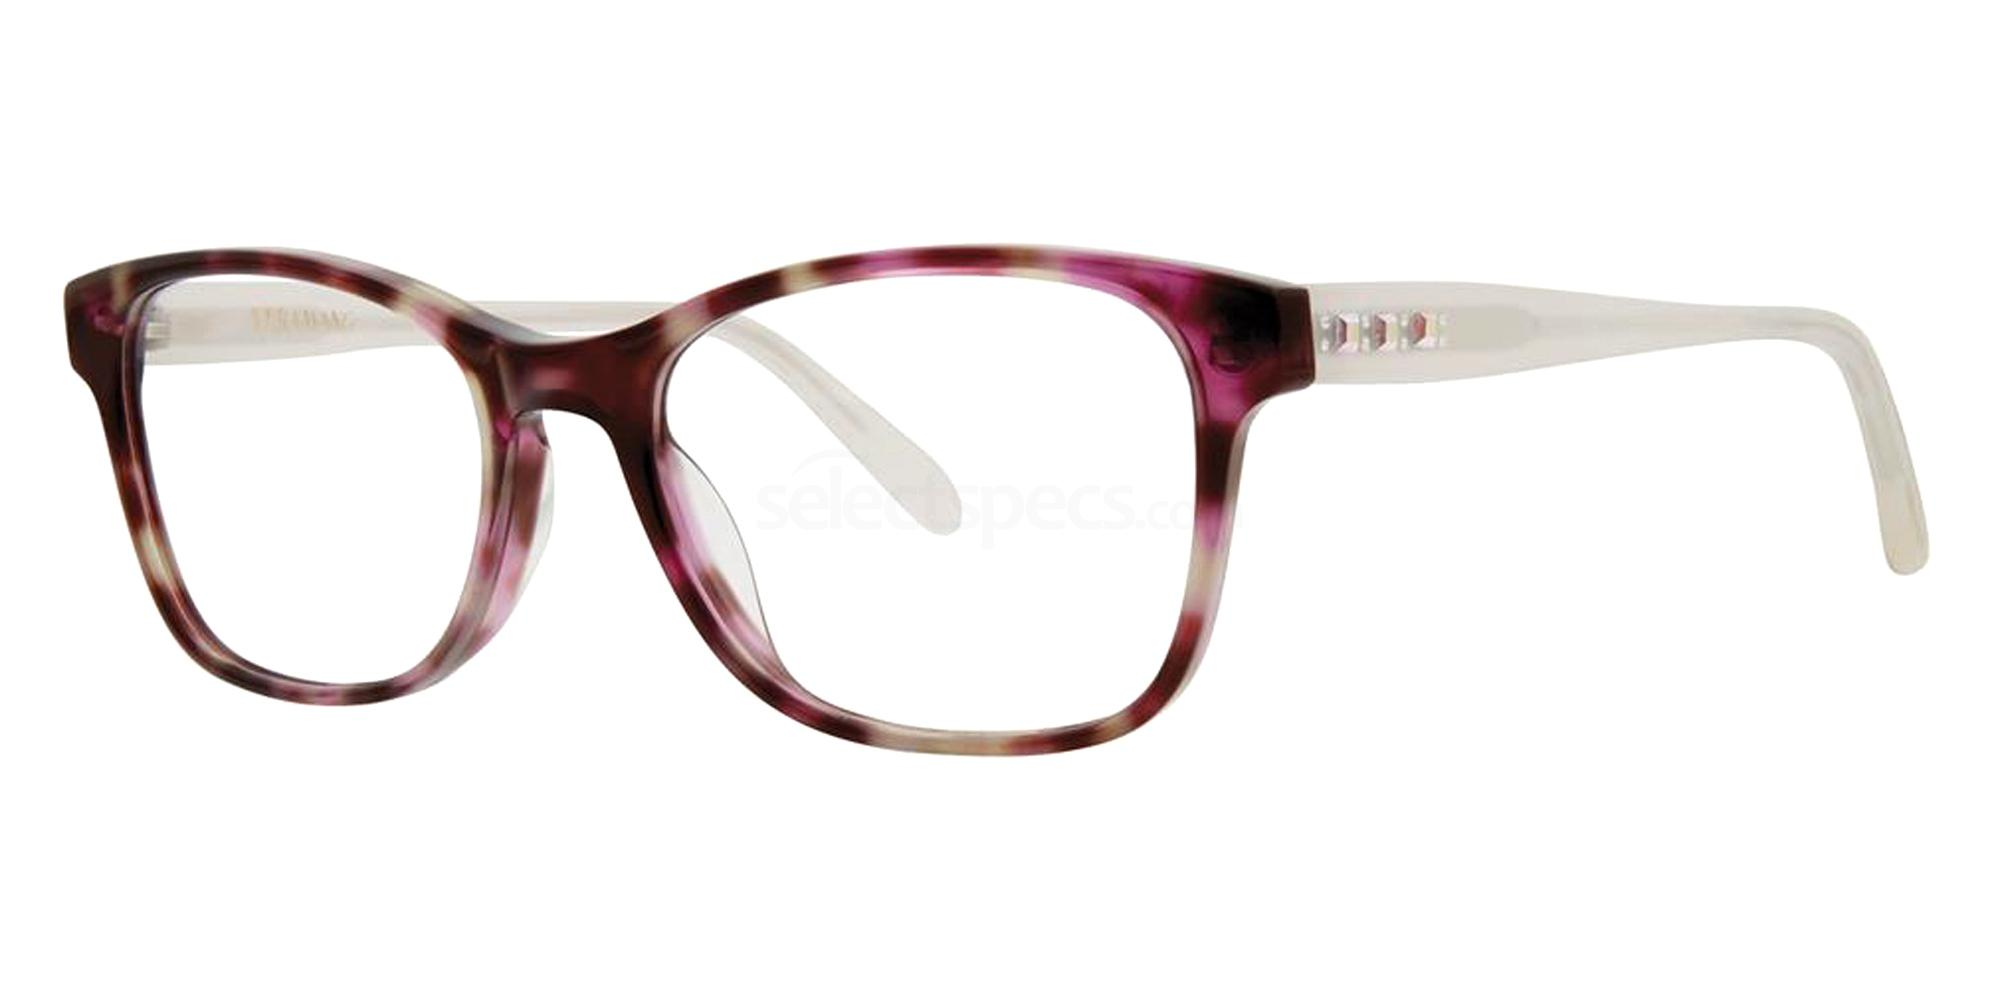 Amethyst Tortoise KAMI Glasses, Vera Wang Luxe